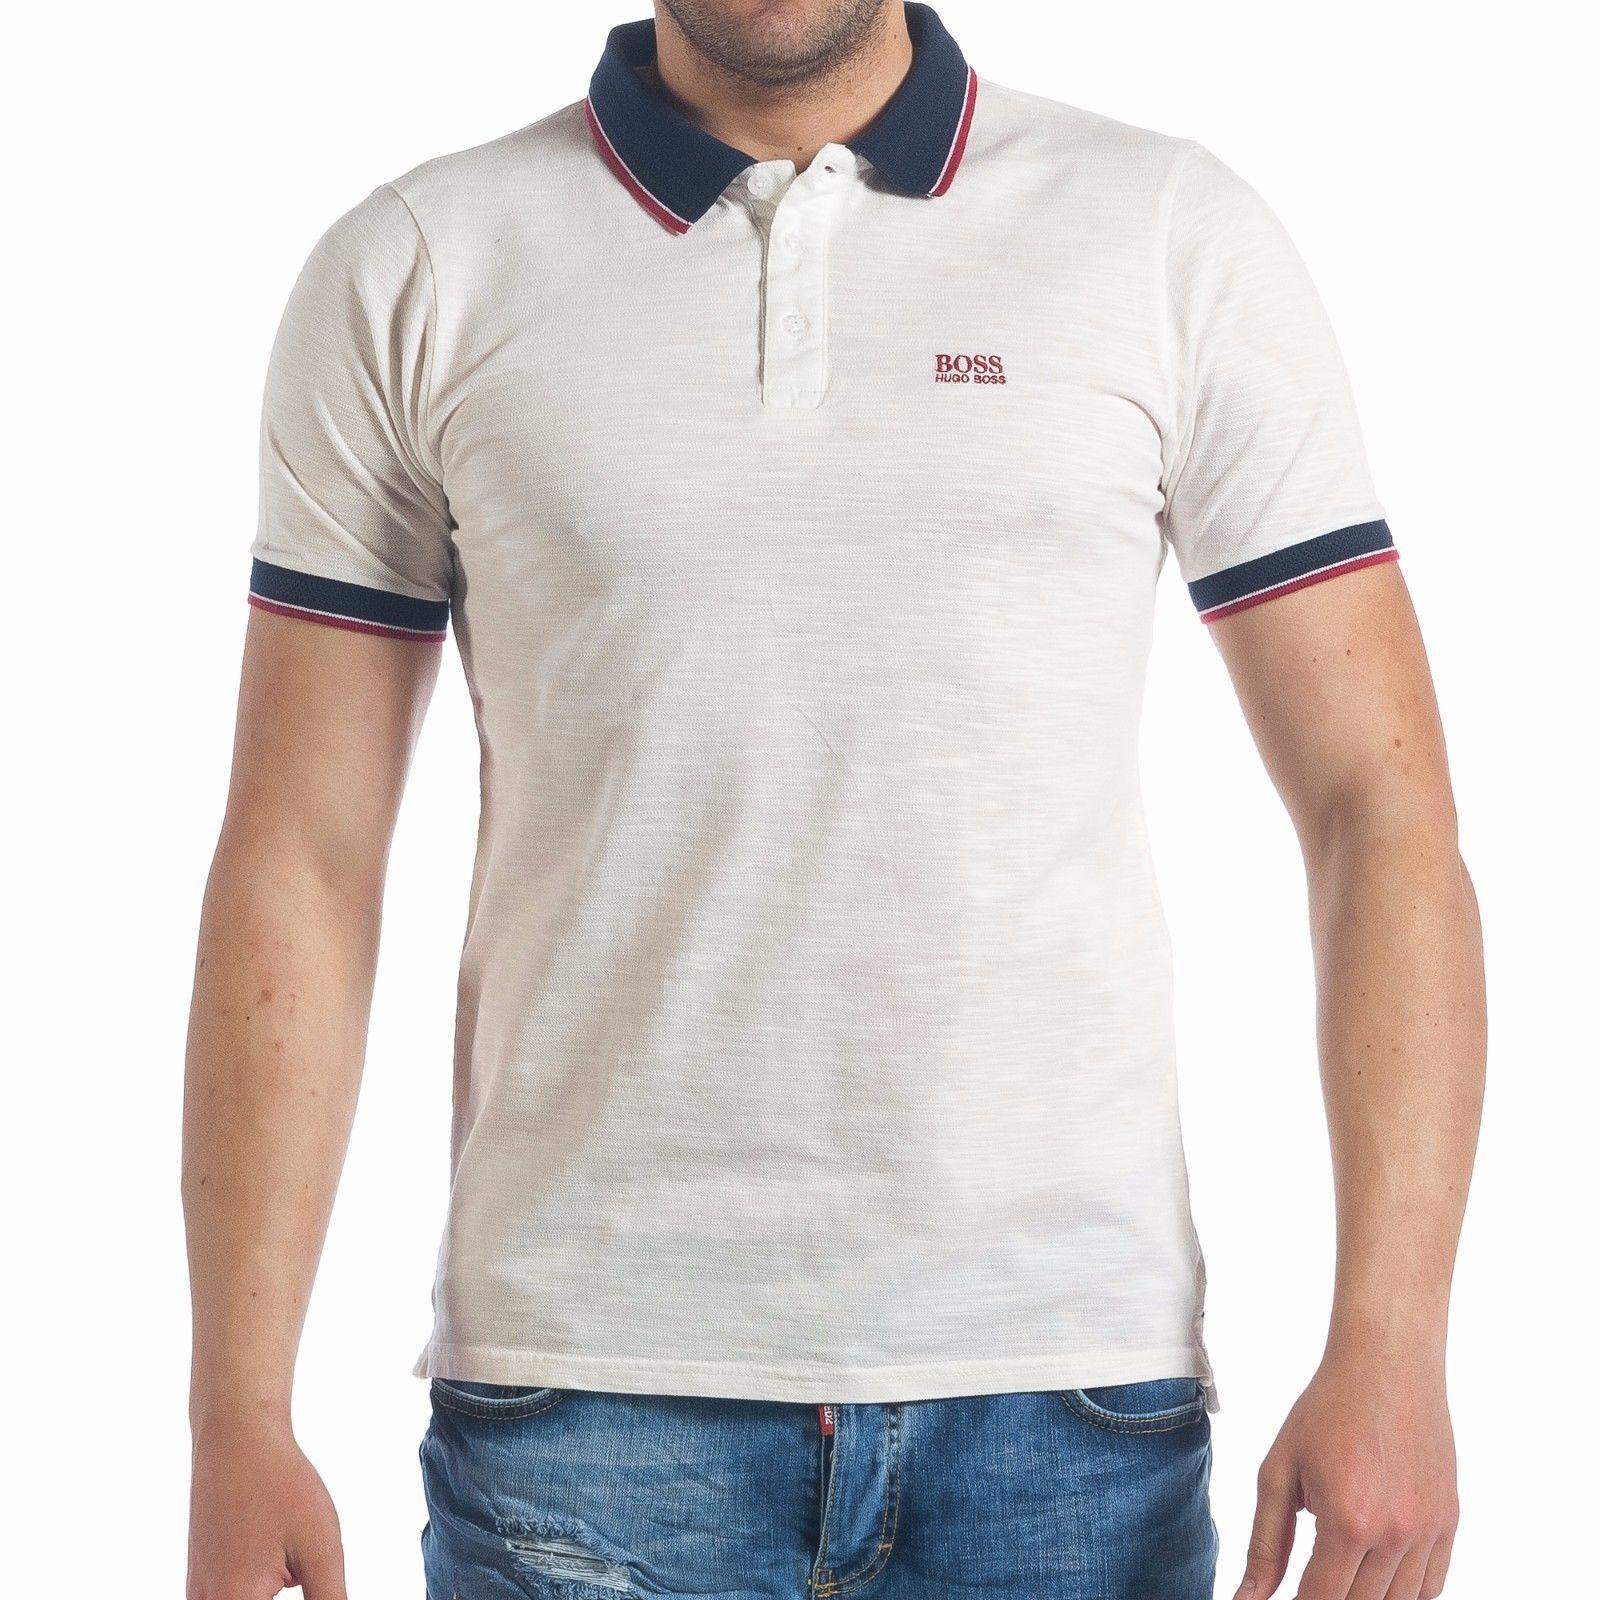 New White Hugo Boss Men/'s Tshirt Size 2XL